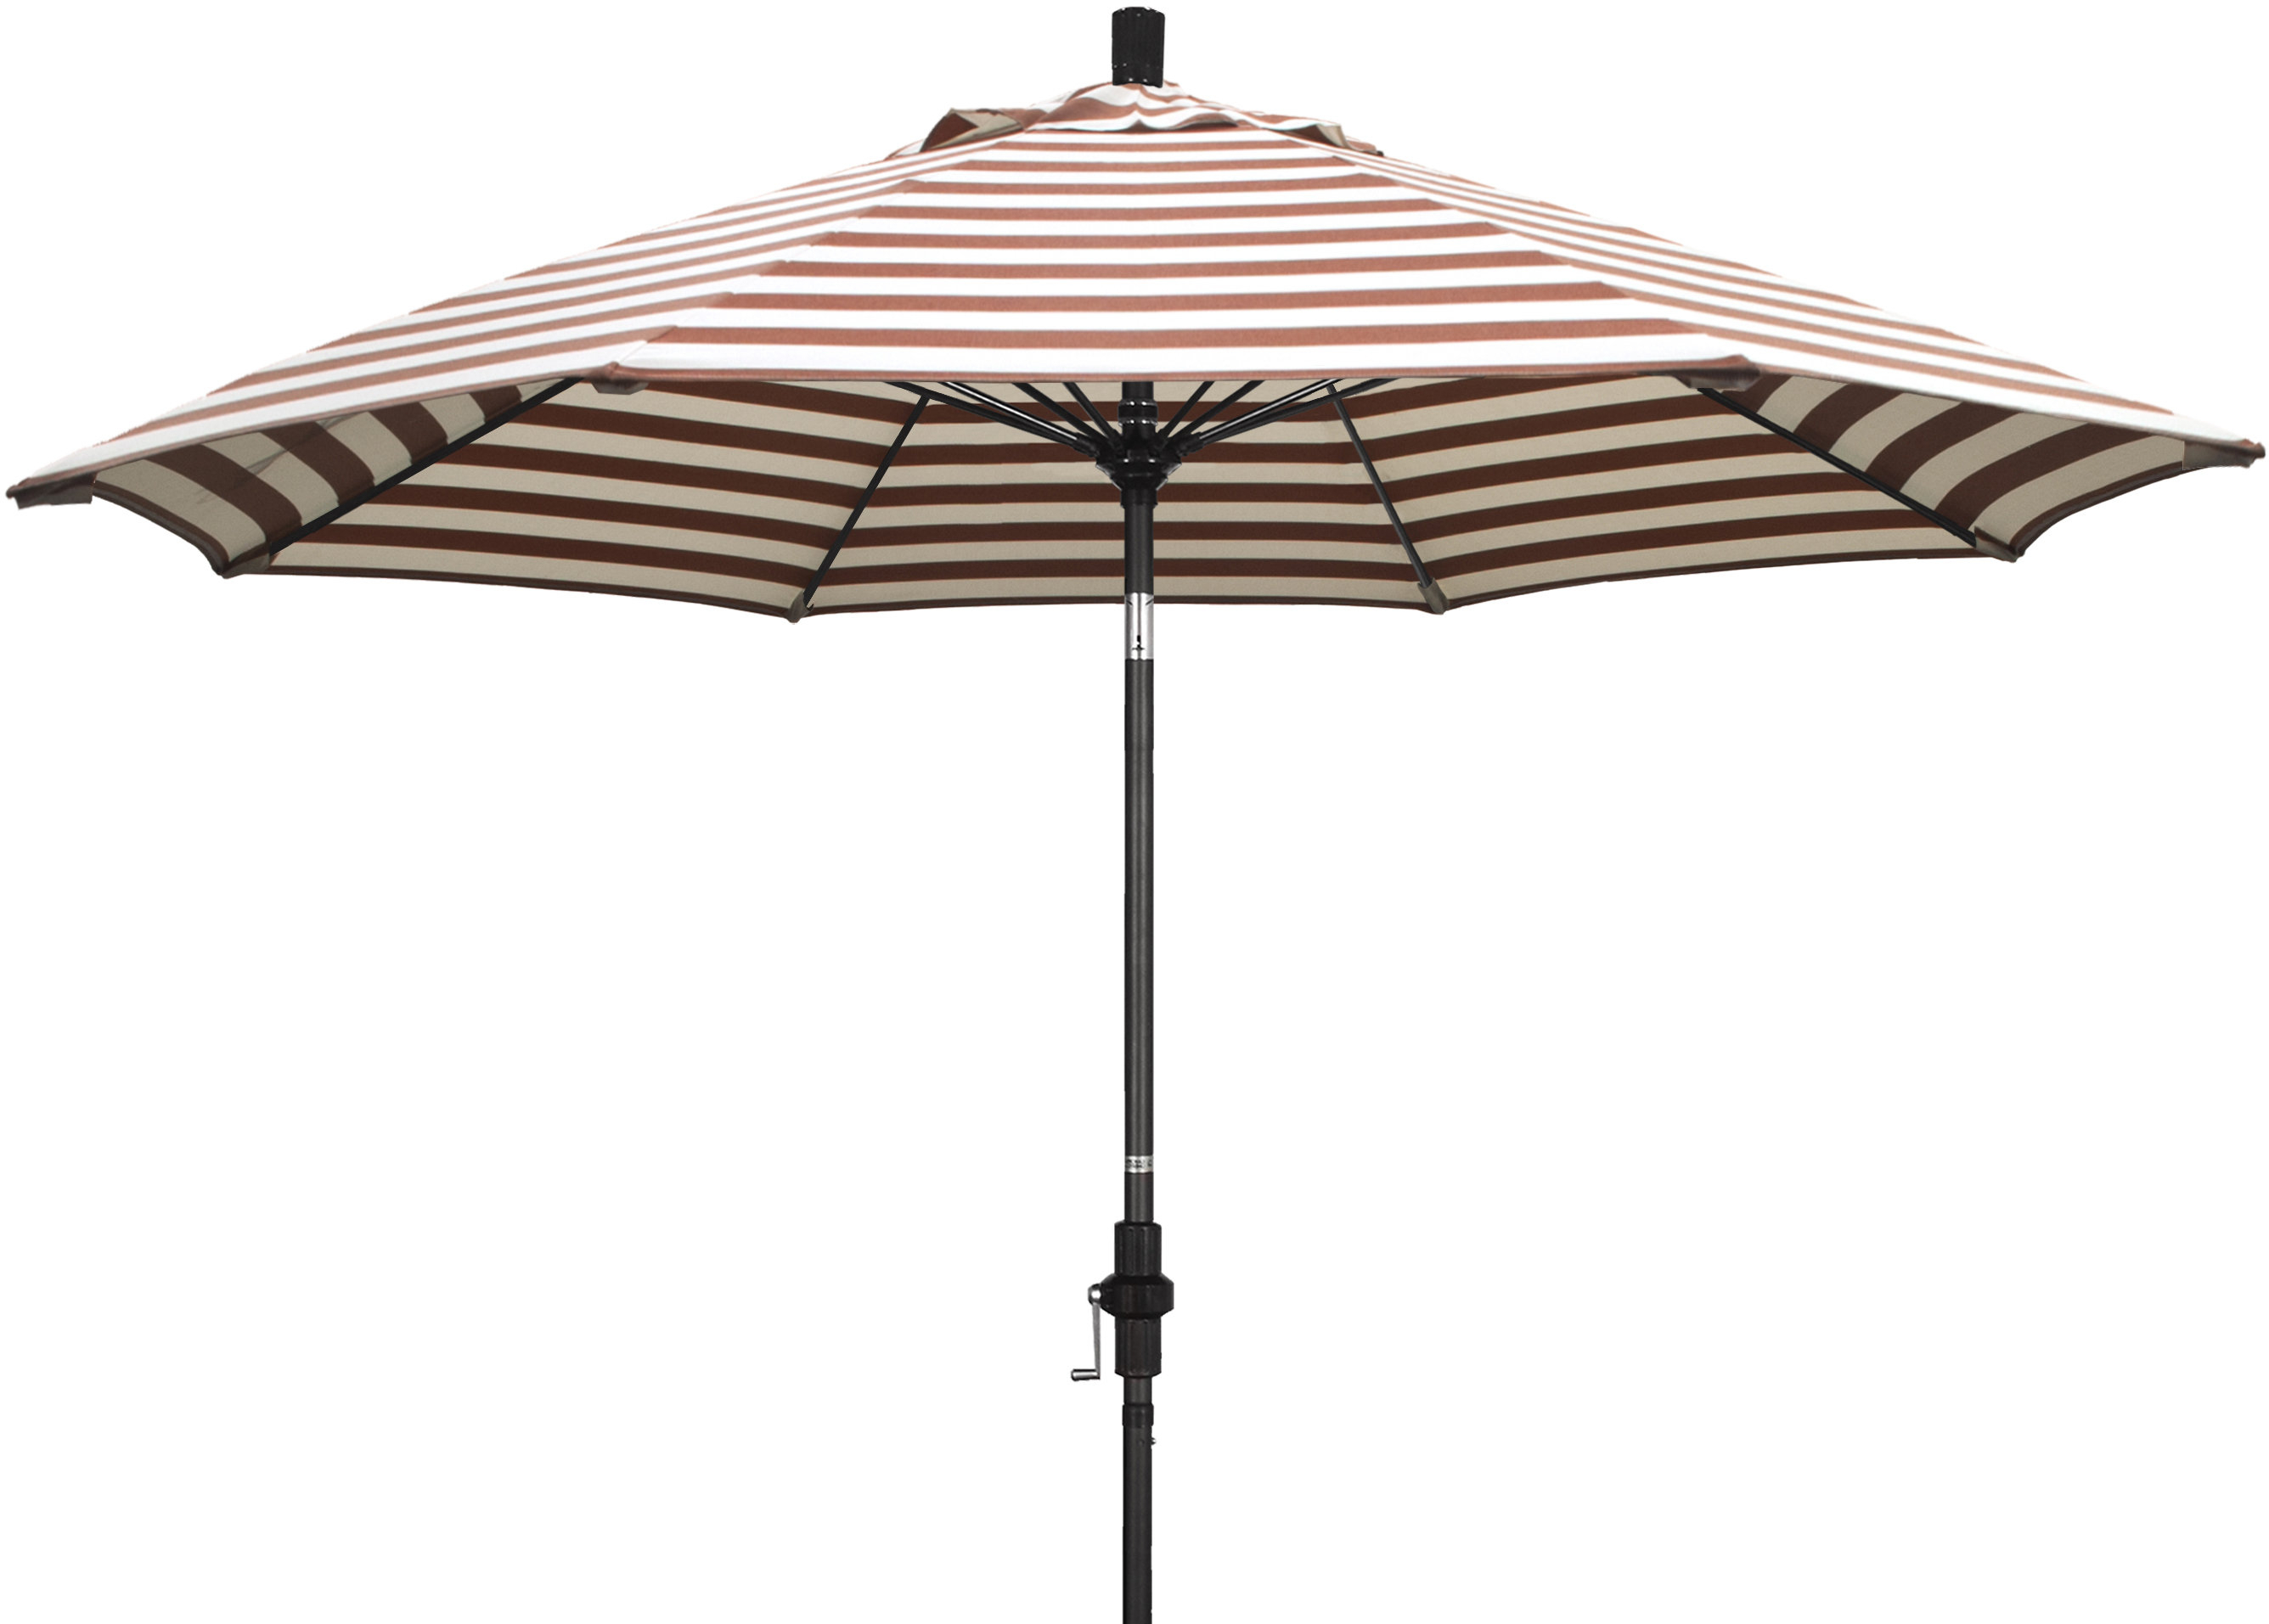 9' Market Umbrella Within Fashionable Lambeth Market Umbrellas (Gallery 12 of 20)